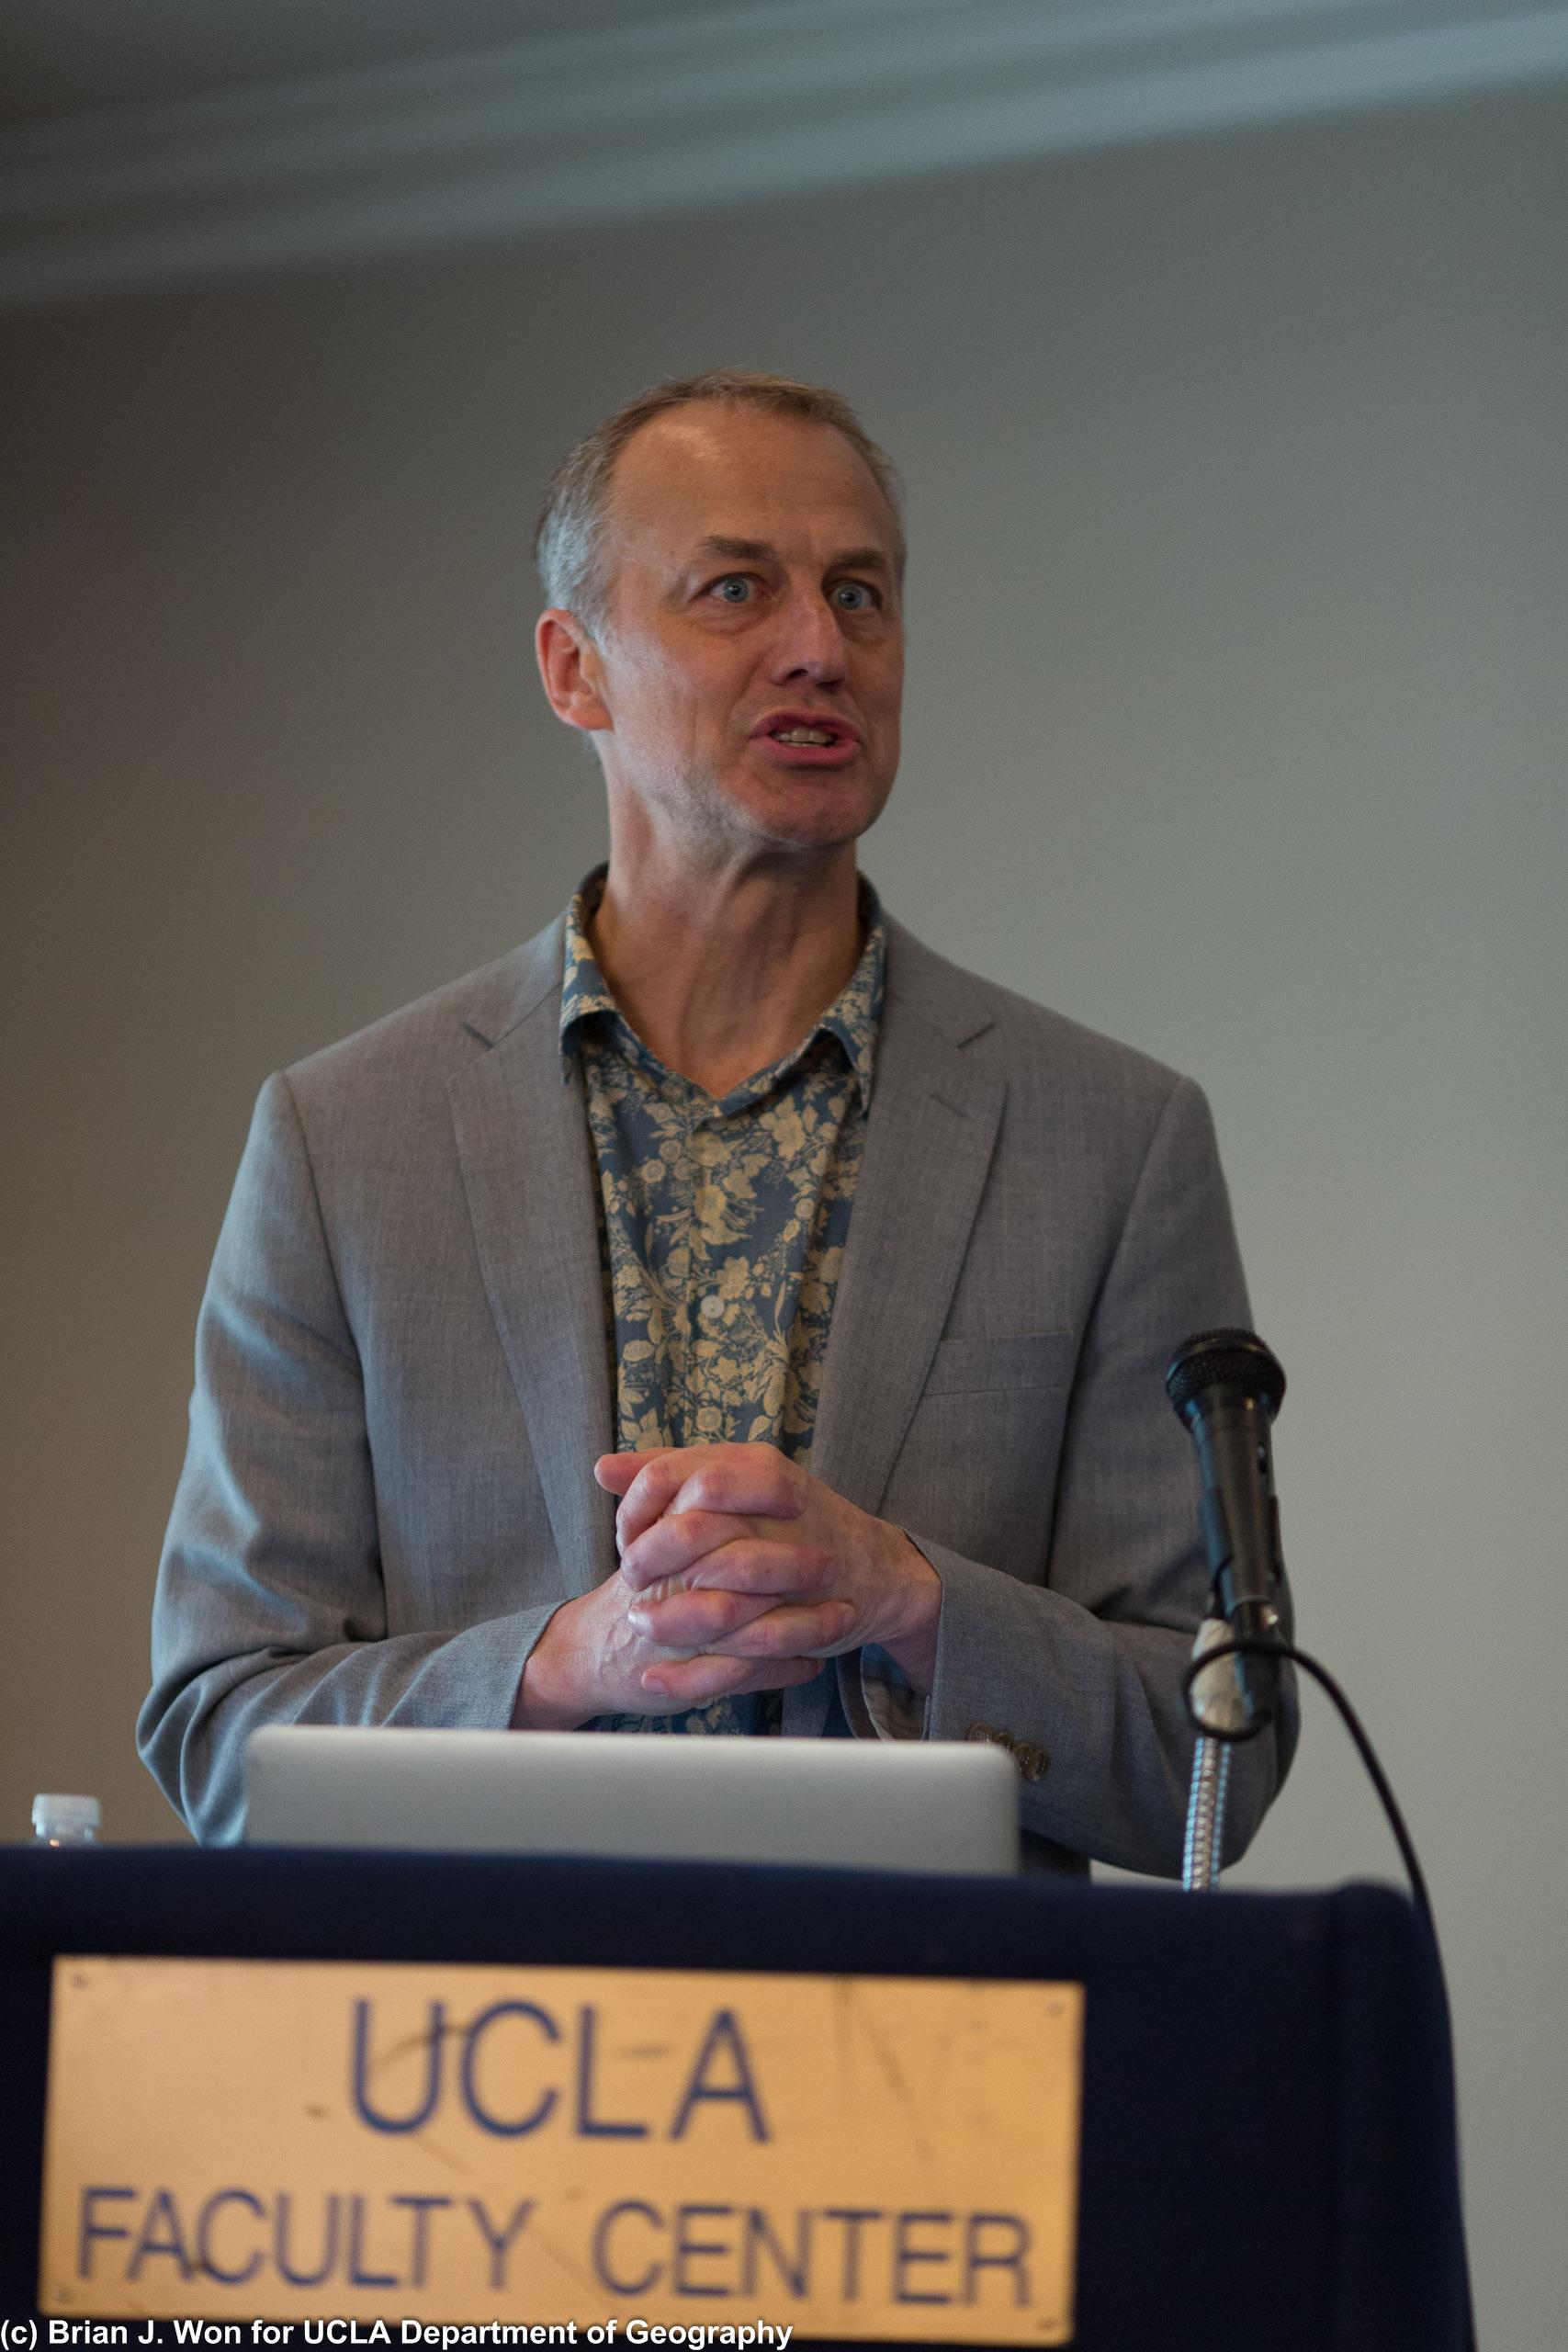 Professor Bruce Braum, speaker